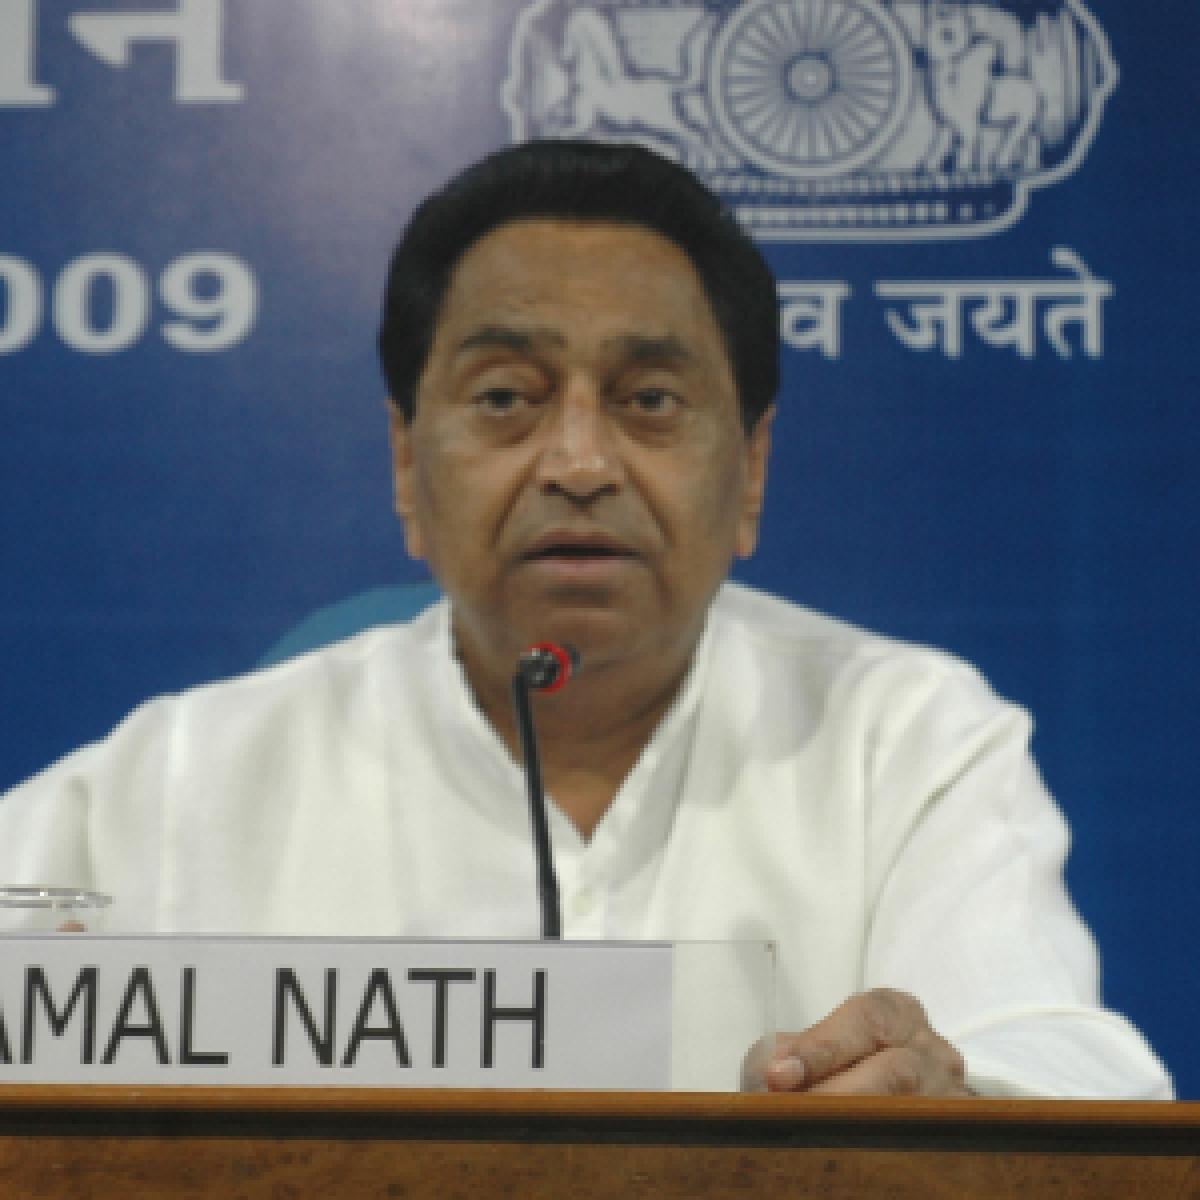 File photo of Kamal Nath